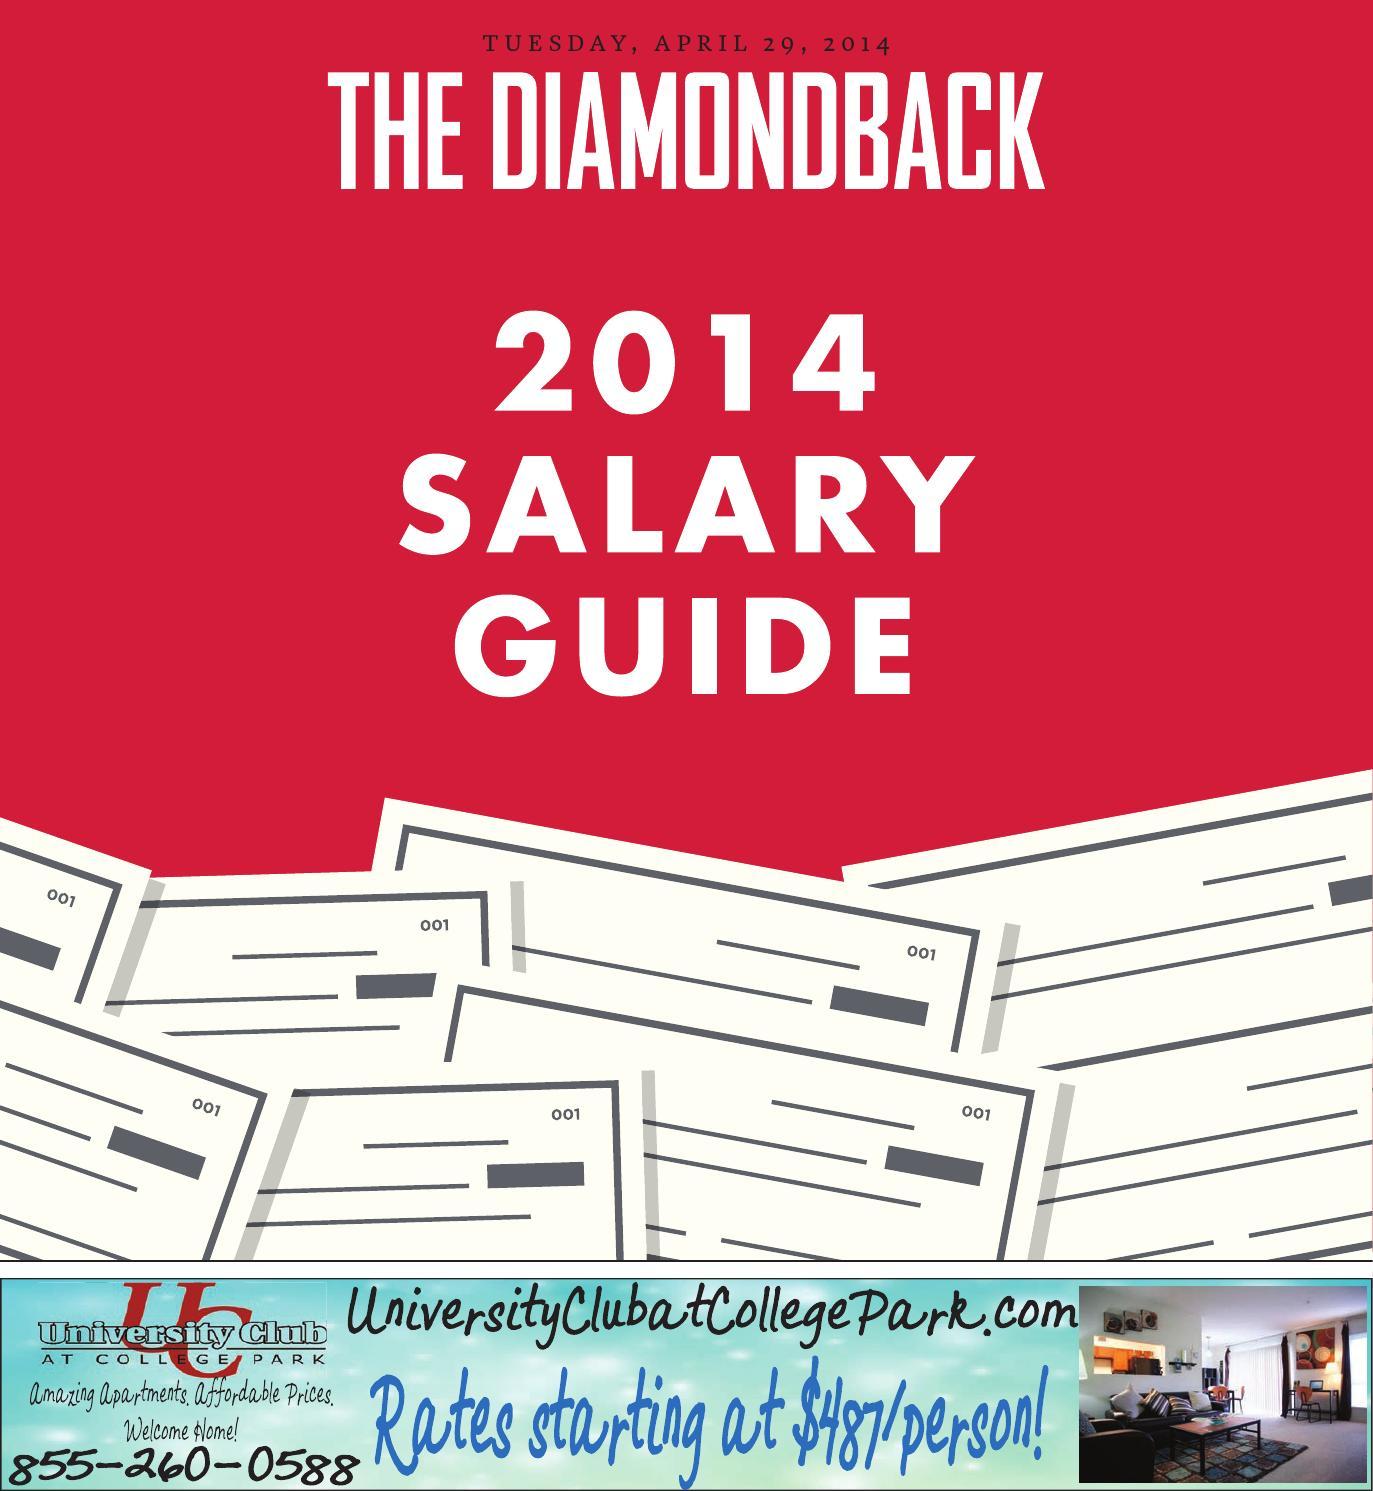 2014 Diamondback Salary Guide by The Diamondback - issuu